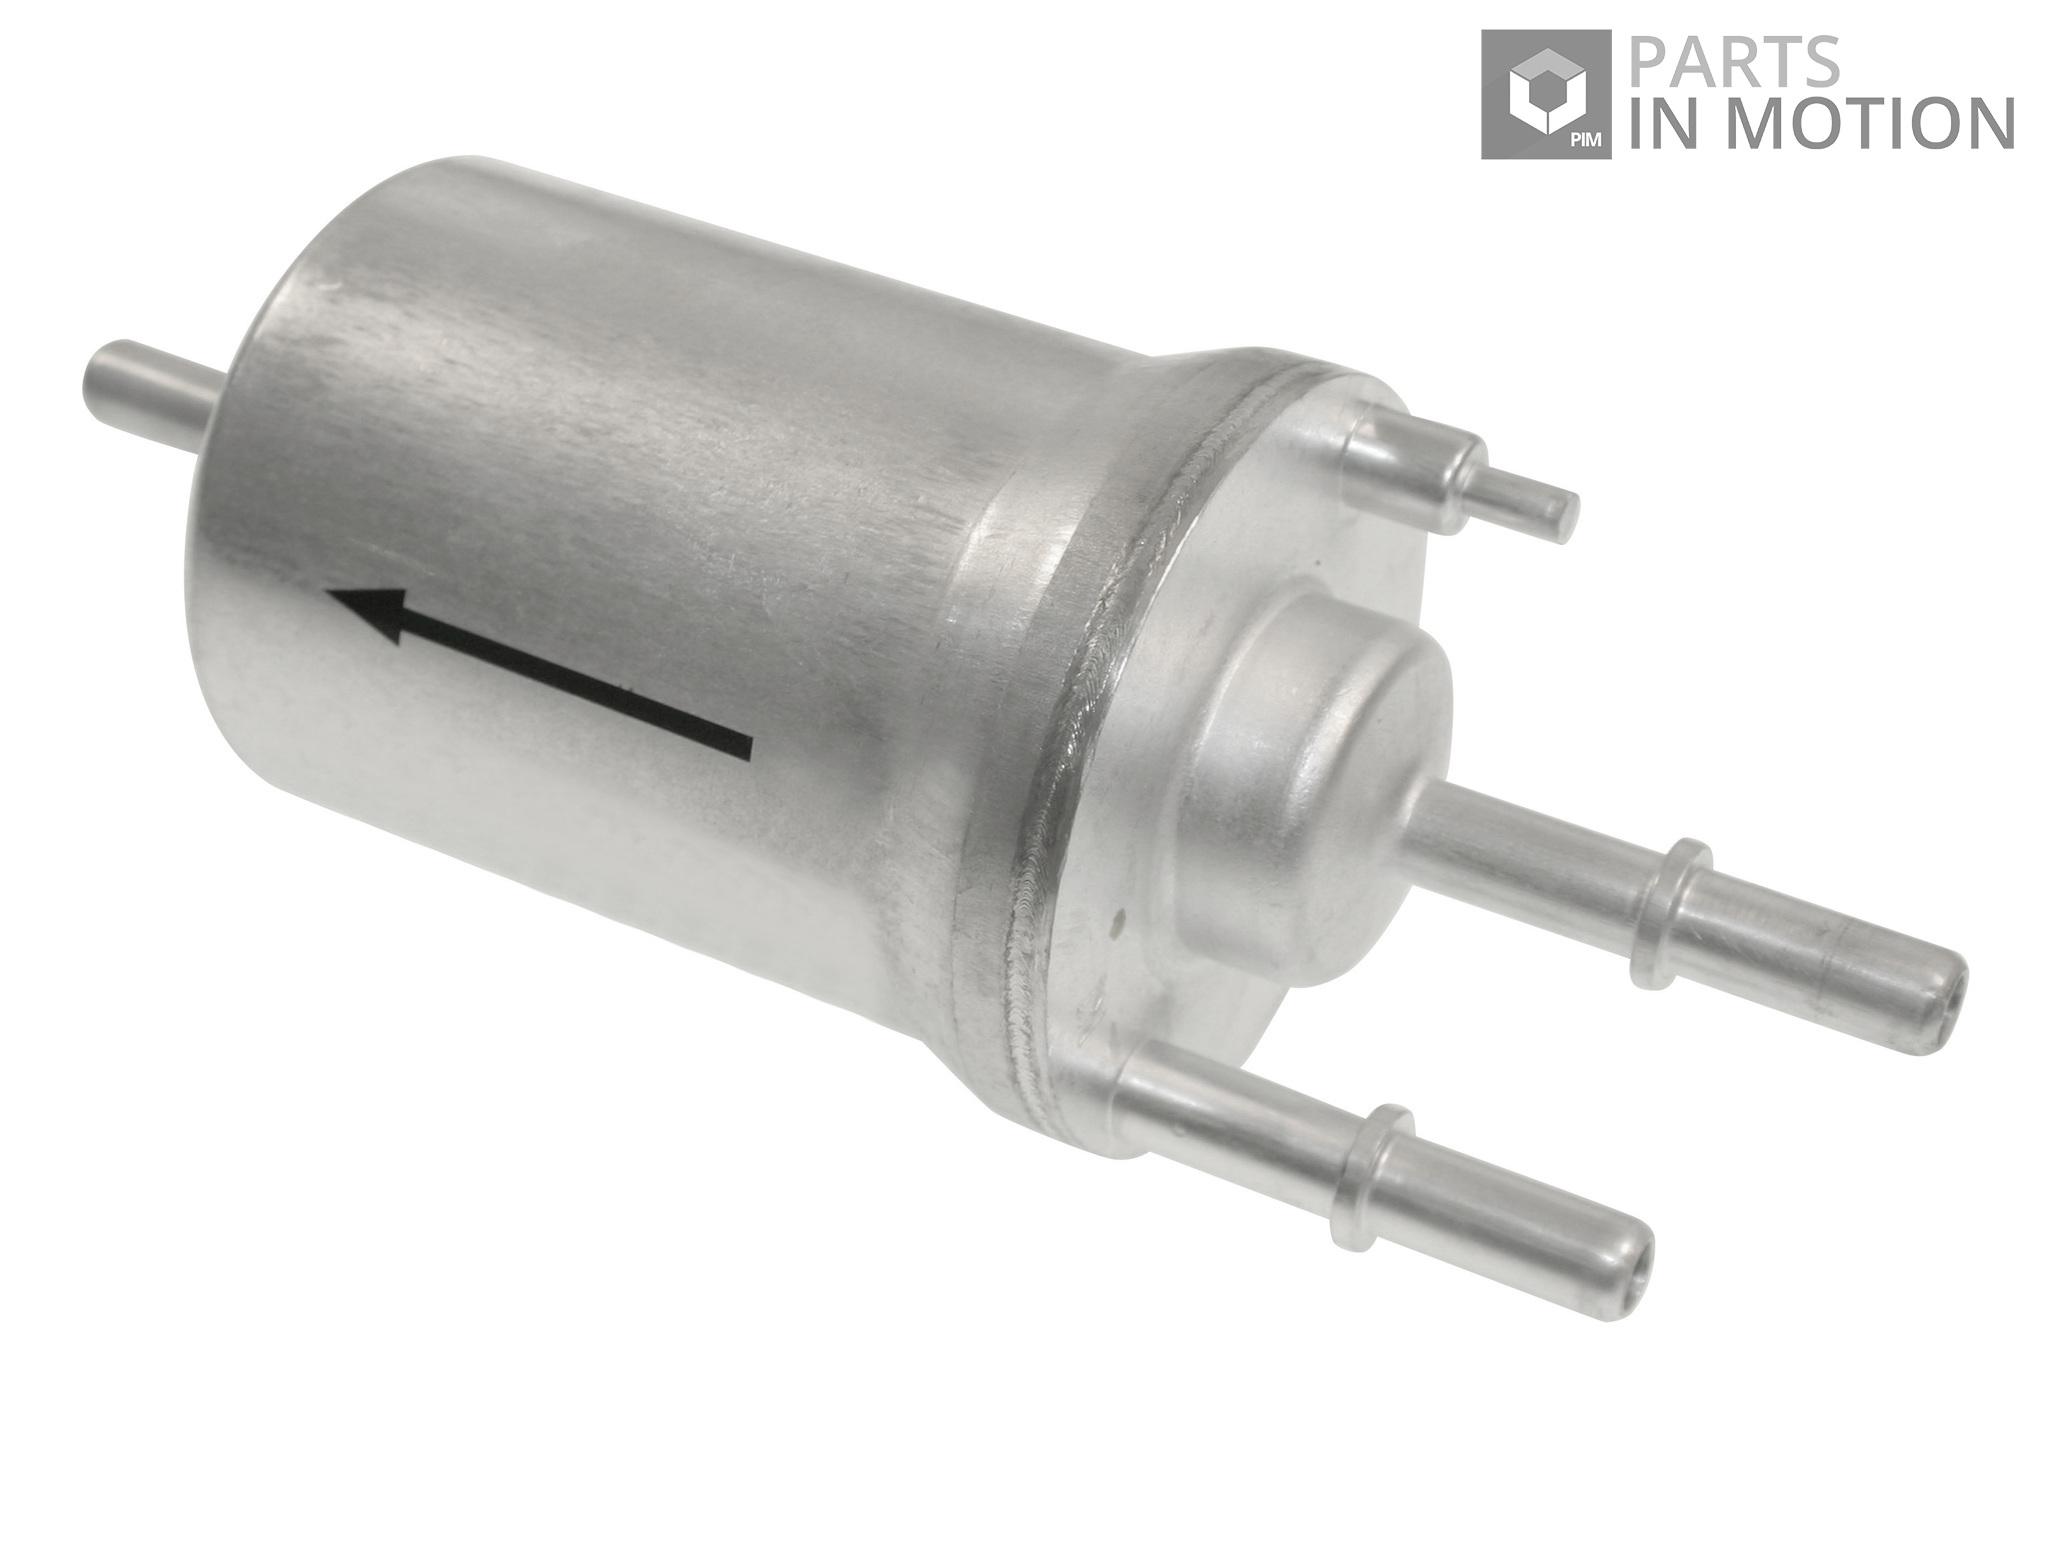 Skoda Octavia 1z Fuel Filter 12 14 16 18 20 04 To 13 Adl 05 6 0 Housing Blue Print Adv182306